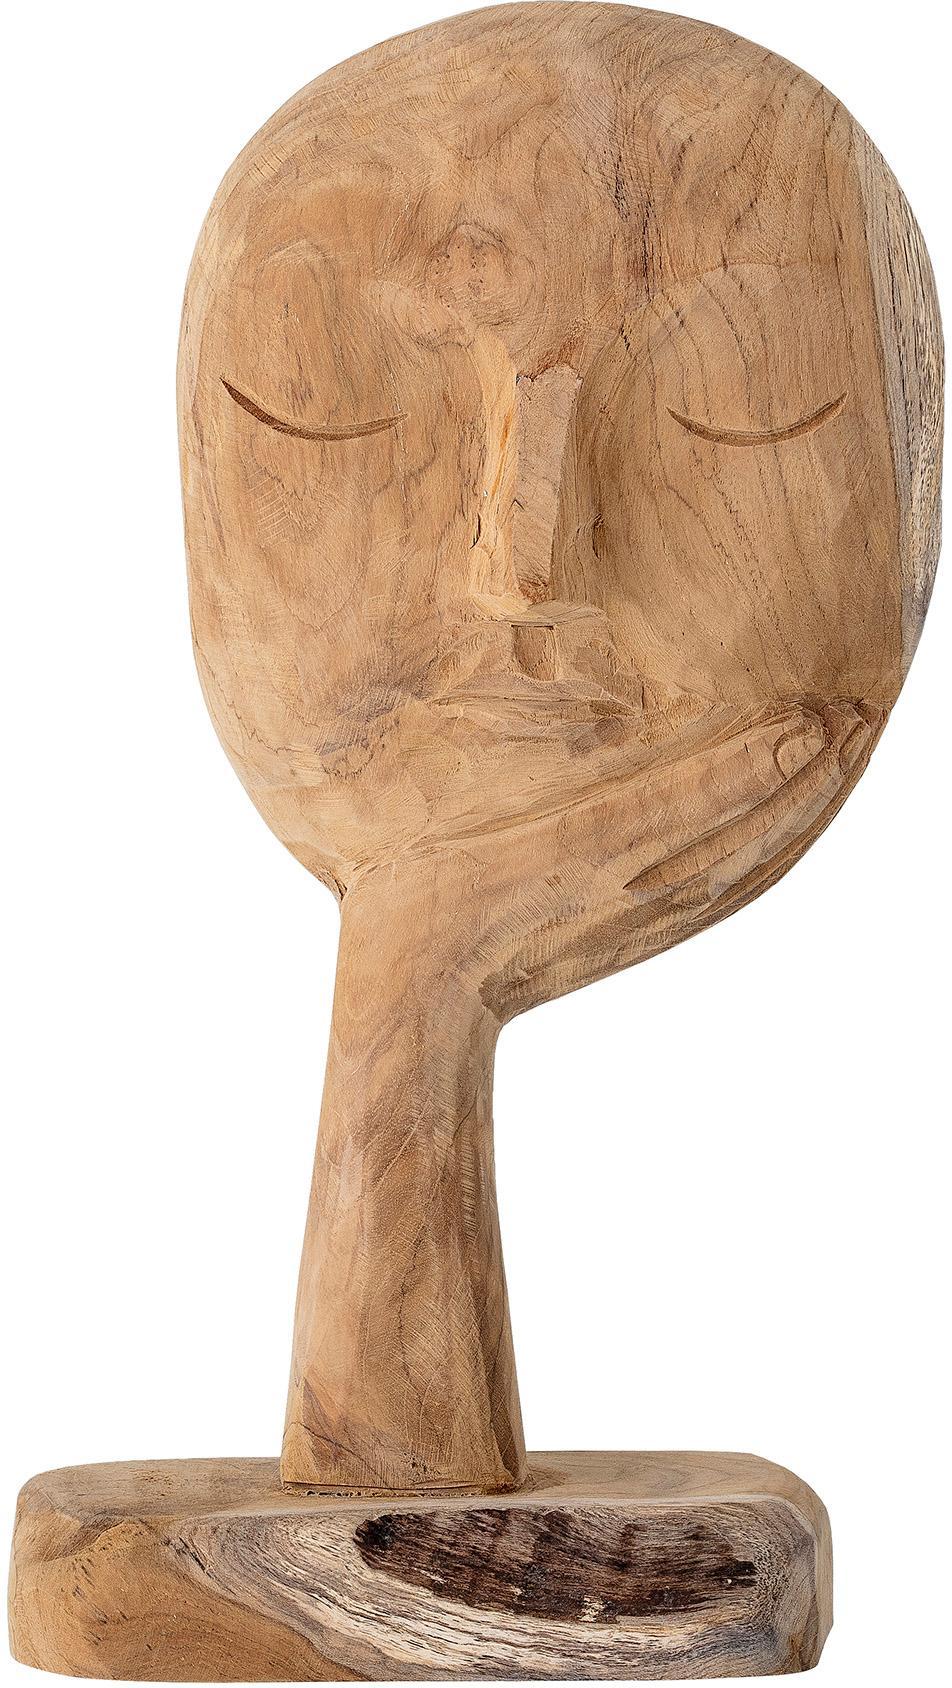 Figura decorativa artesanal Thought, Madera reciclada, Madera, An 18 x Al 35 cm